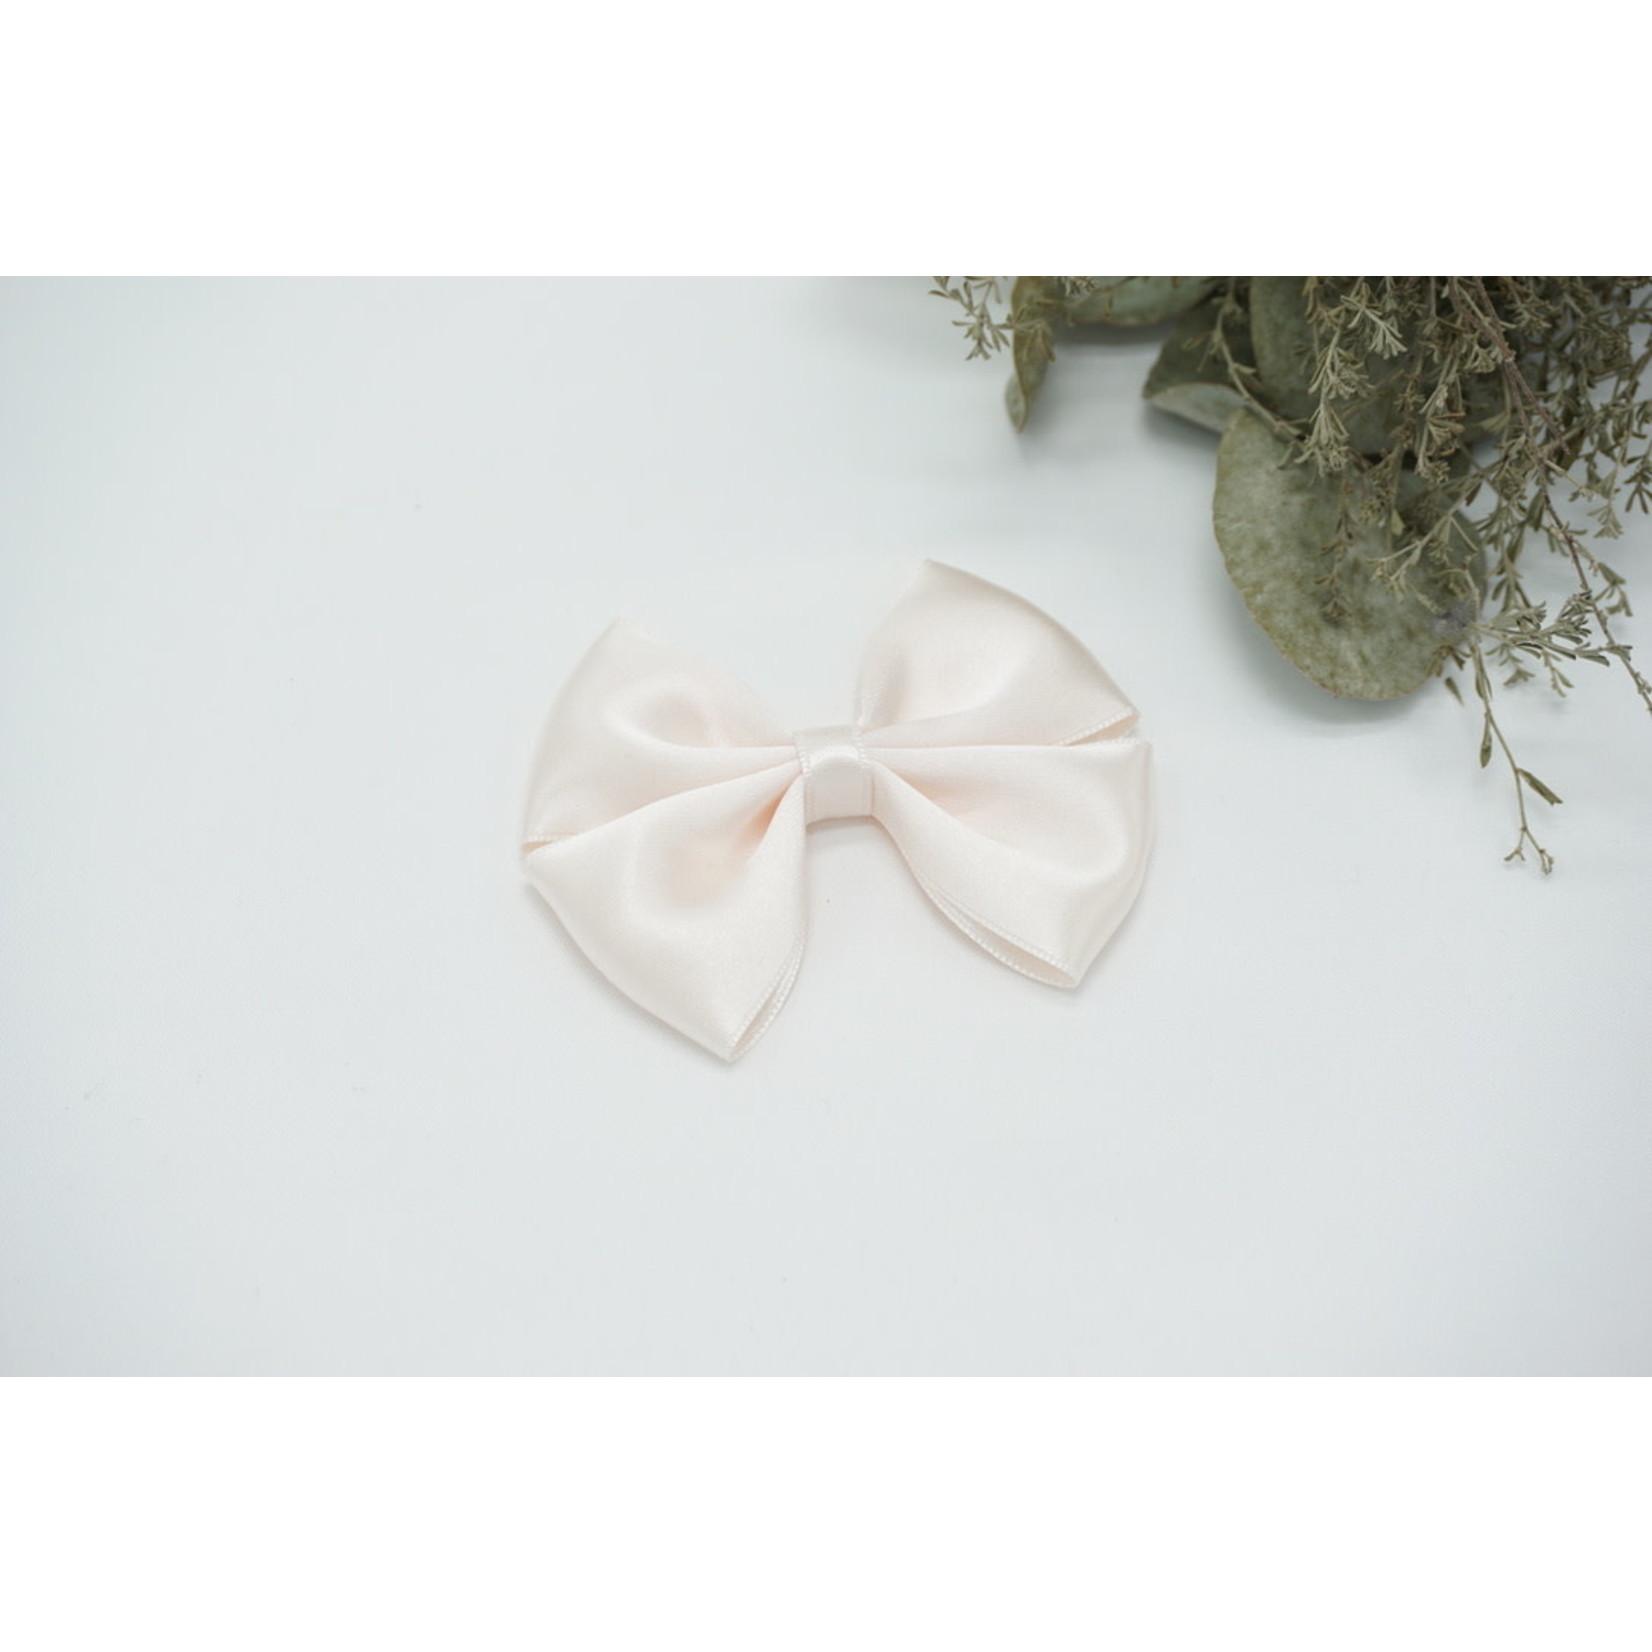 Petite Zara Satin Bow - Old Lace